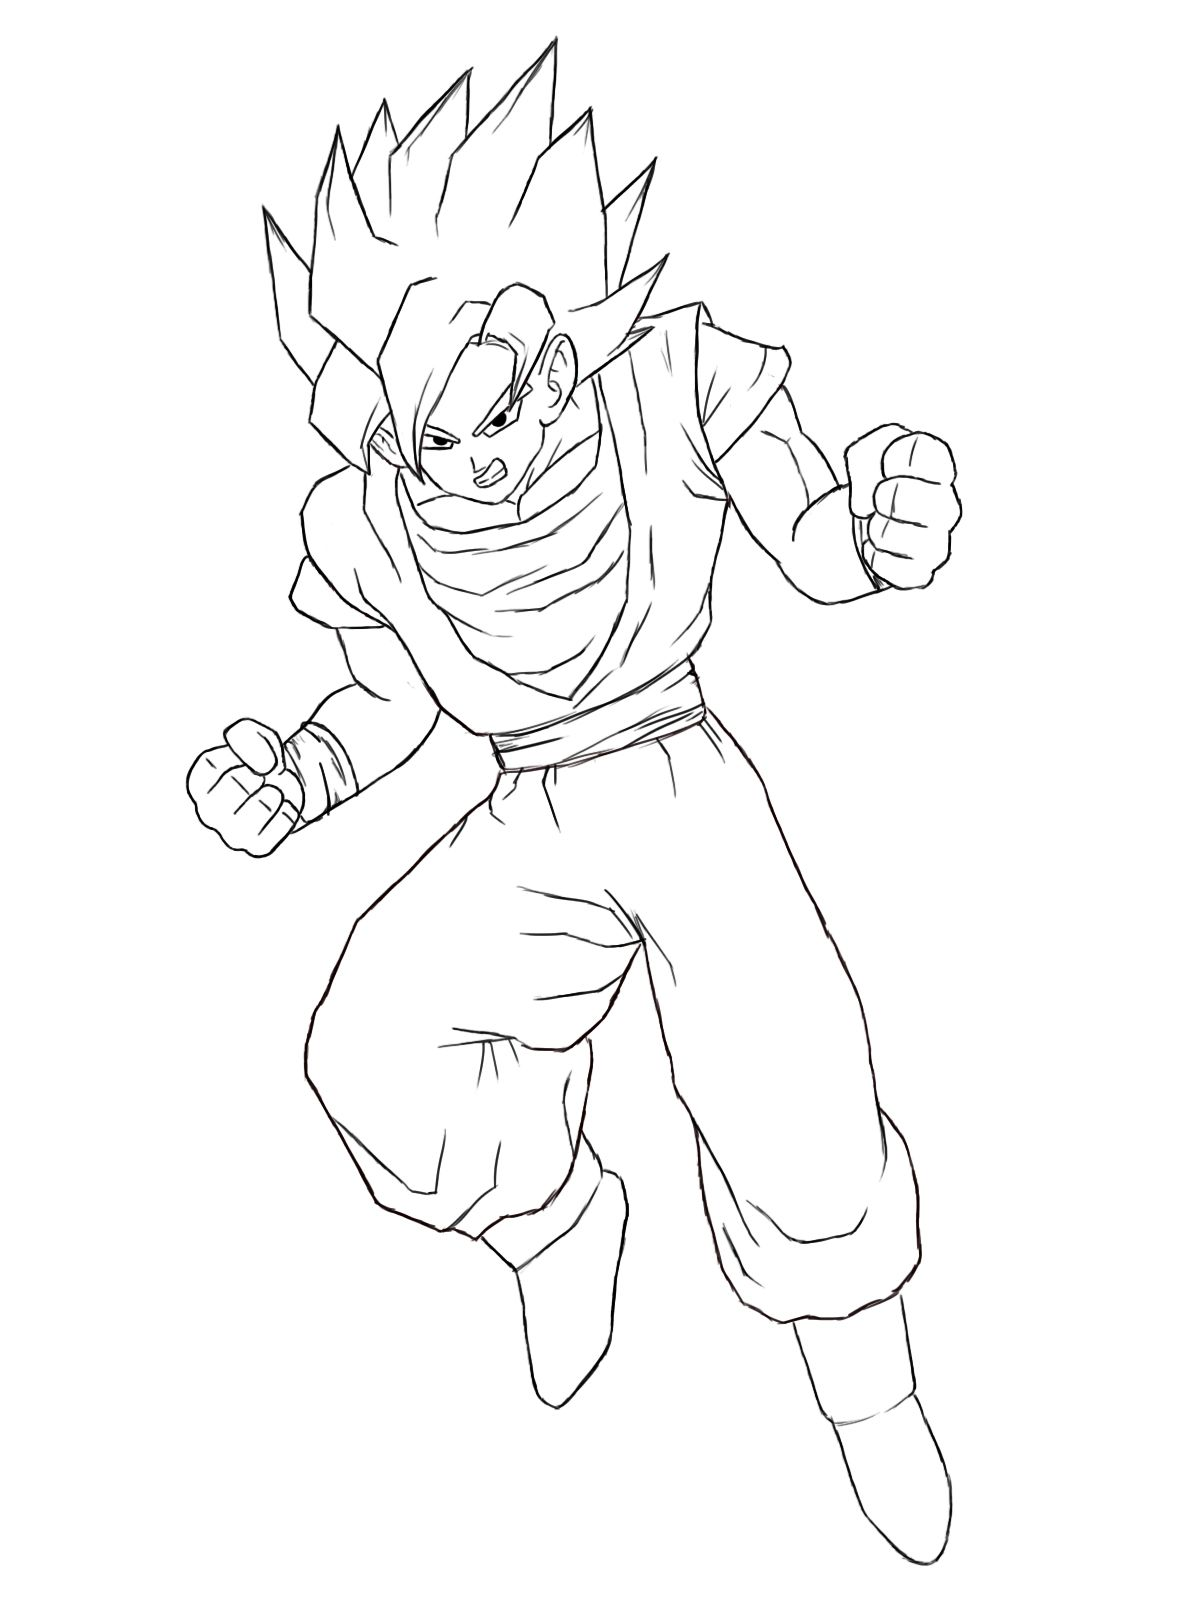 Goku Drawing Easy Full Body : drawing, Sketch, Drawing